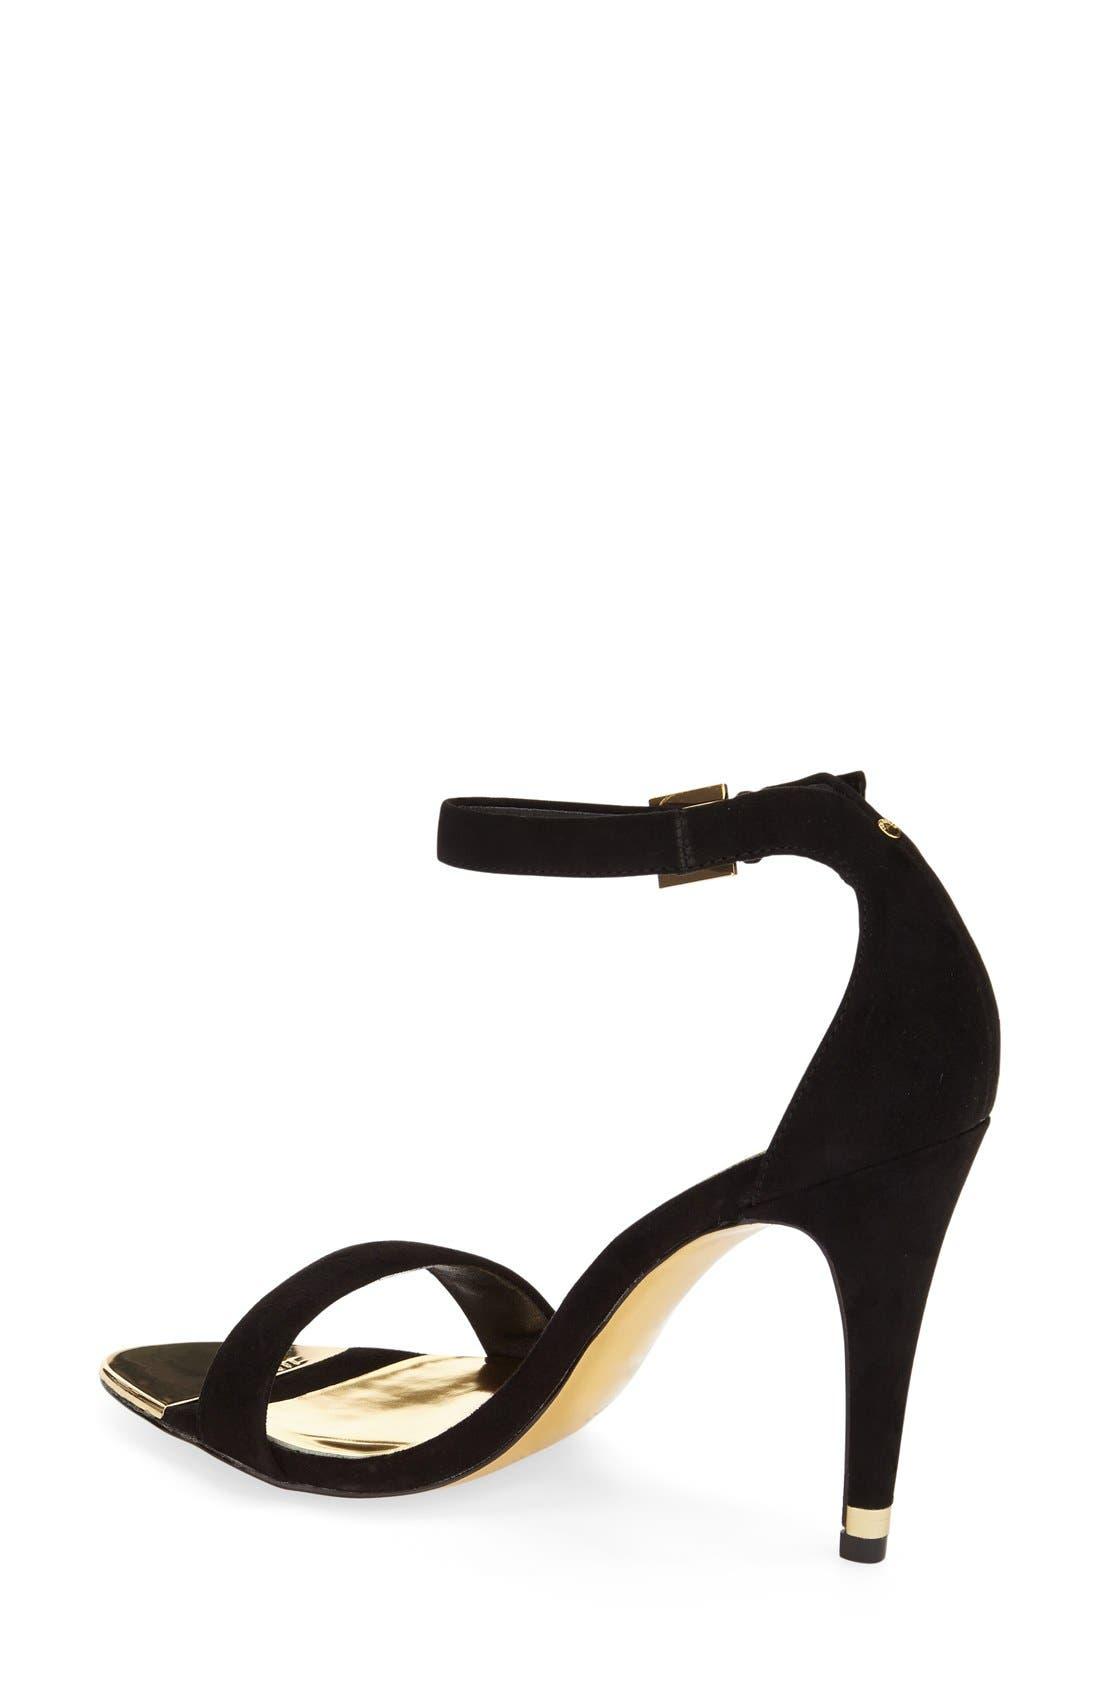 'Juliennas' Leather Sandal,                             Alternate thumbnail 3, color,                             010